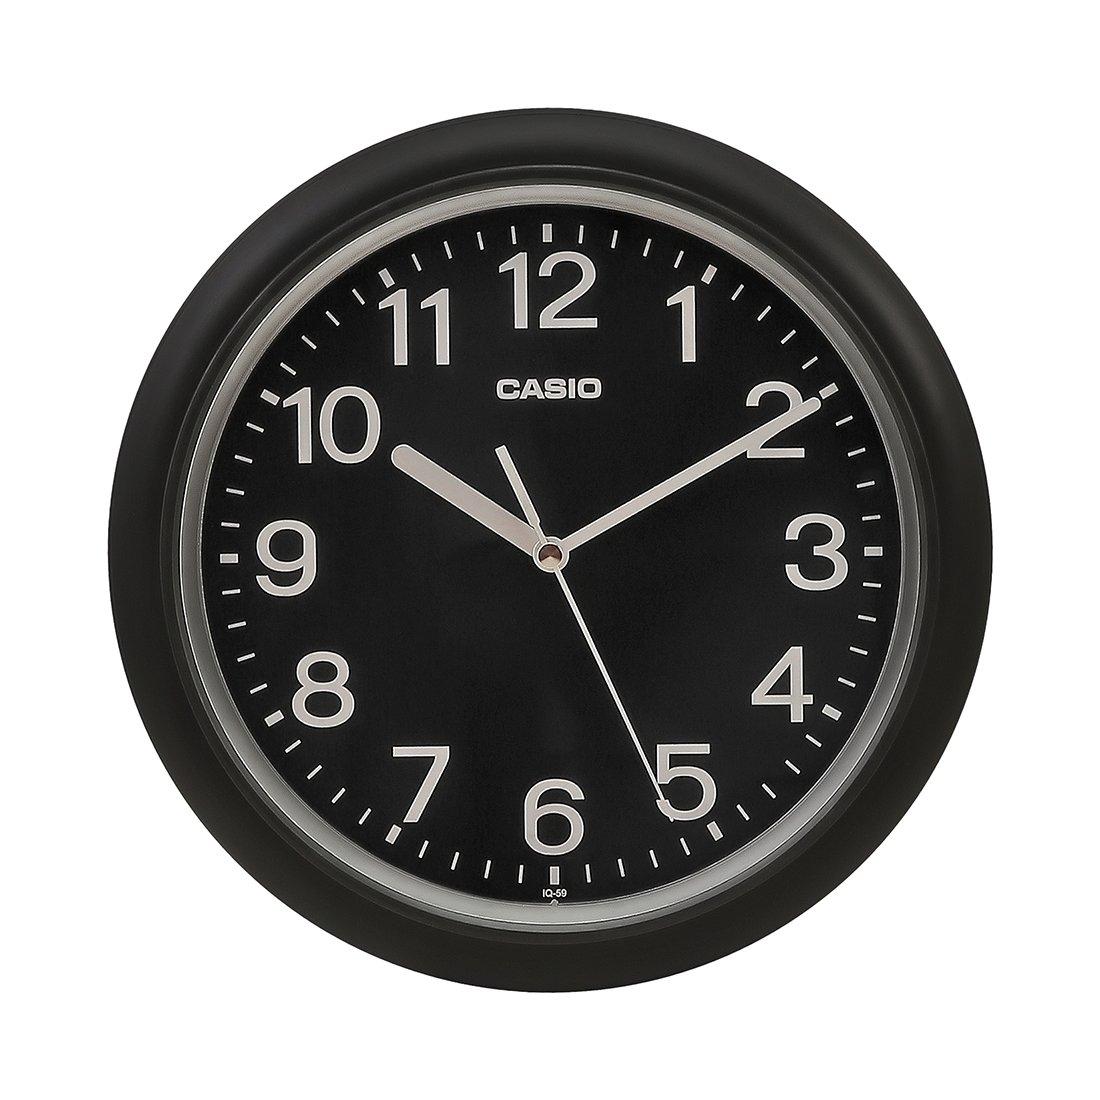 Casio IQ-59-1BDF Analog Wall Clock